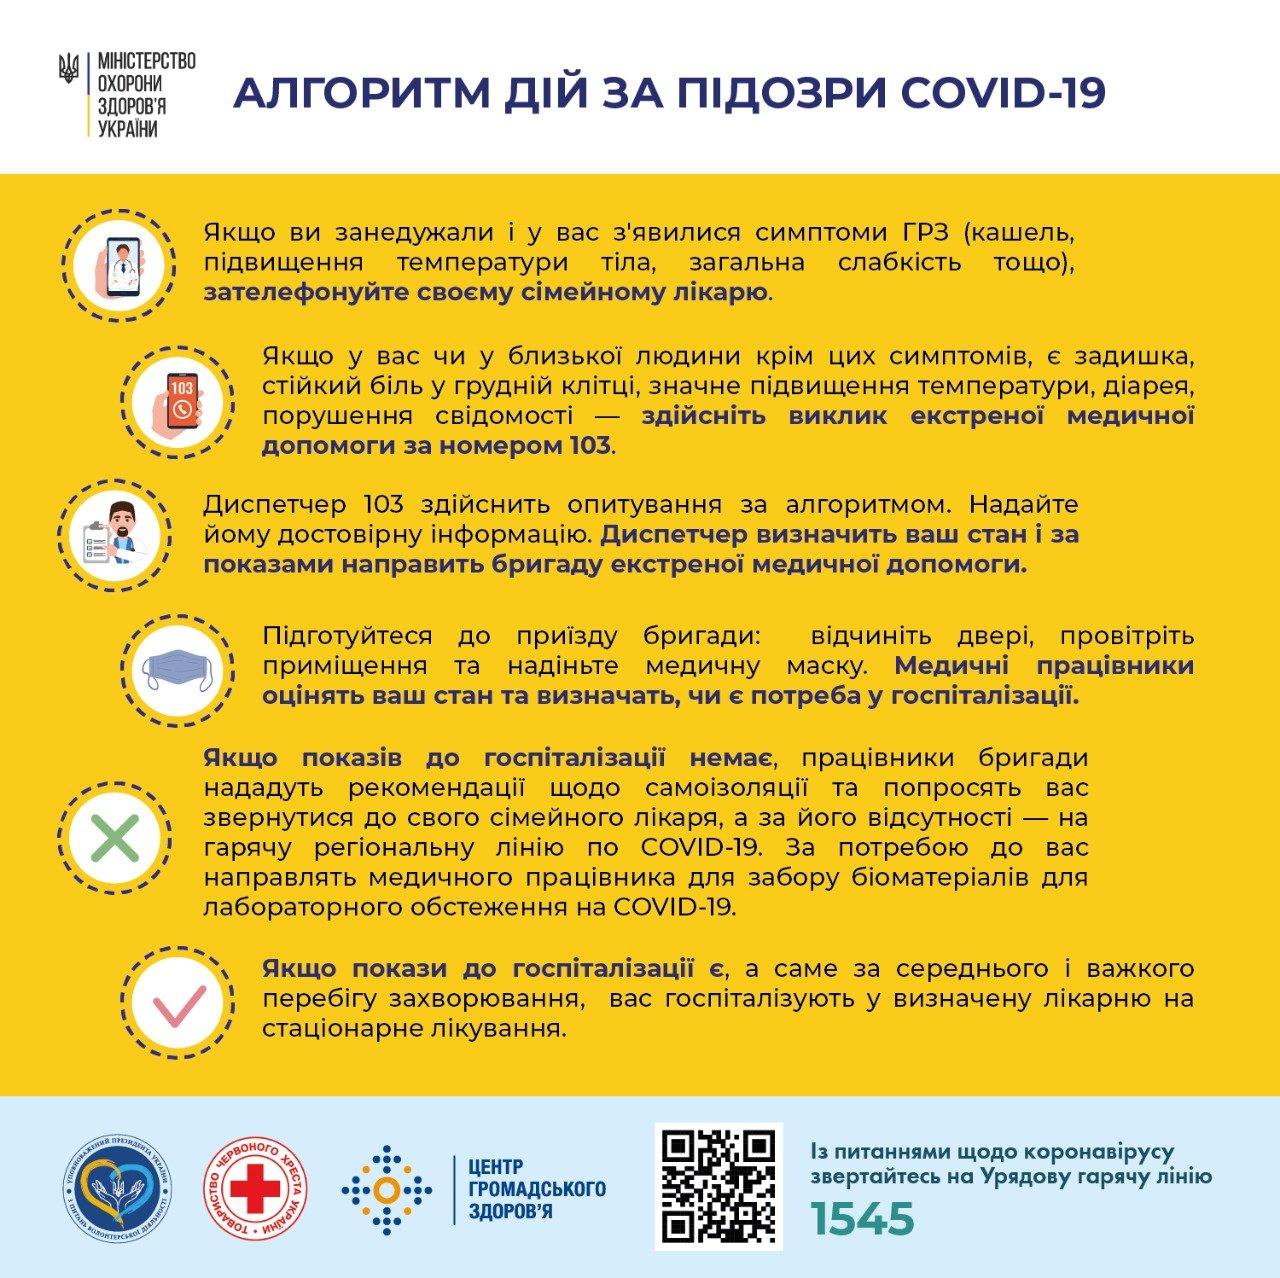 Алгоритм действий при подозрении на коронавирус